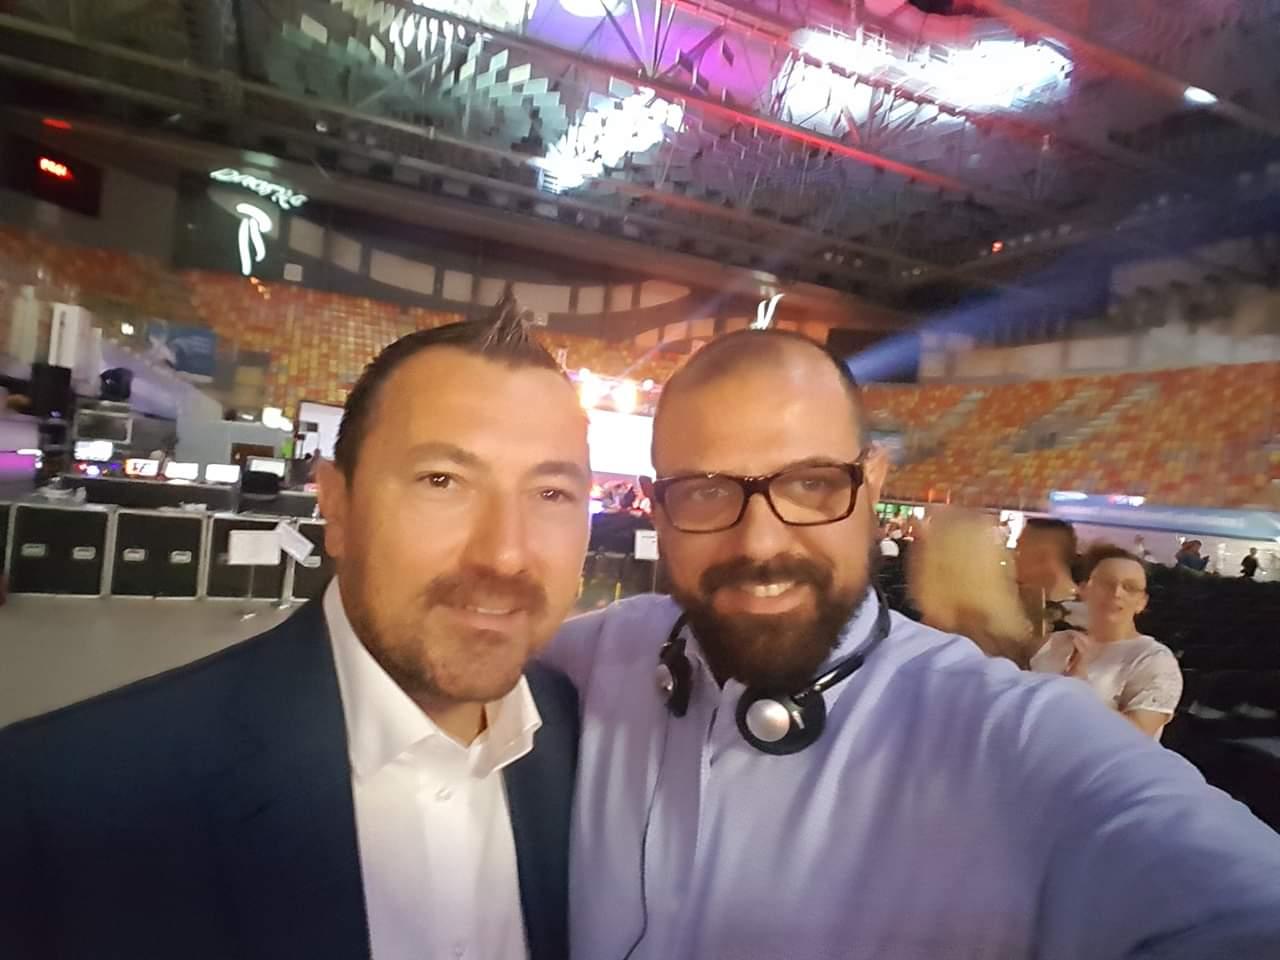 Duolife_2_foto_2019_corrado_cavarra_networker_sicilia_italia21